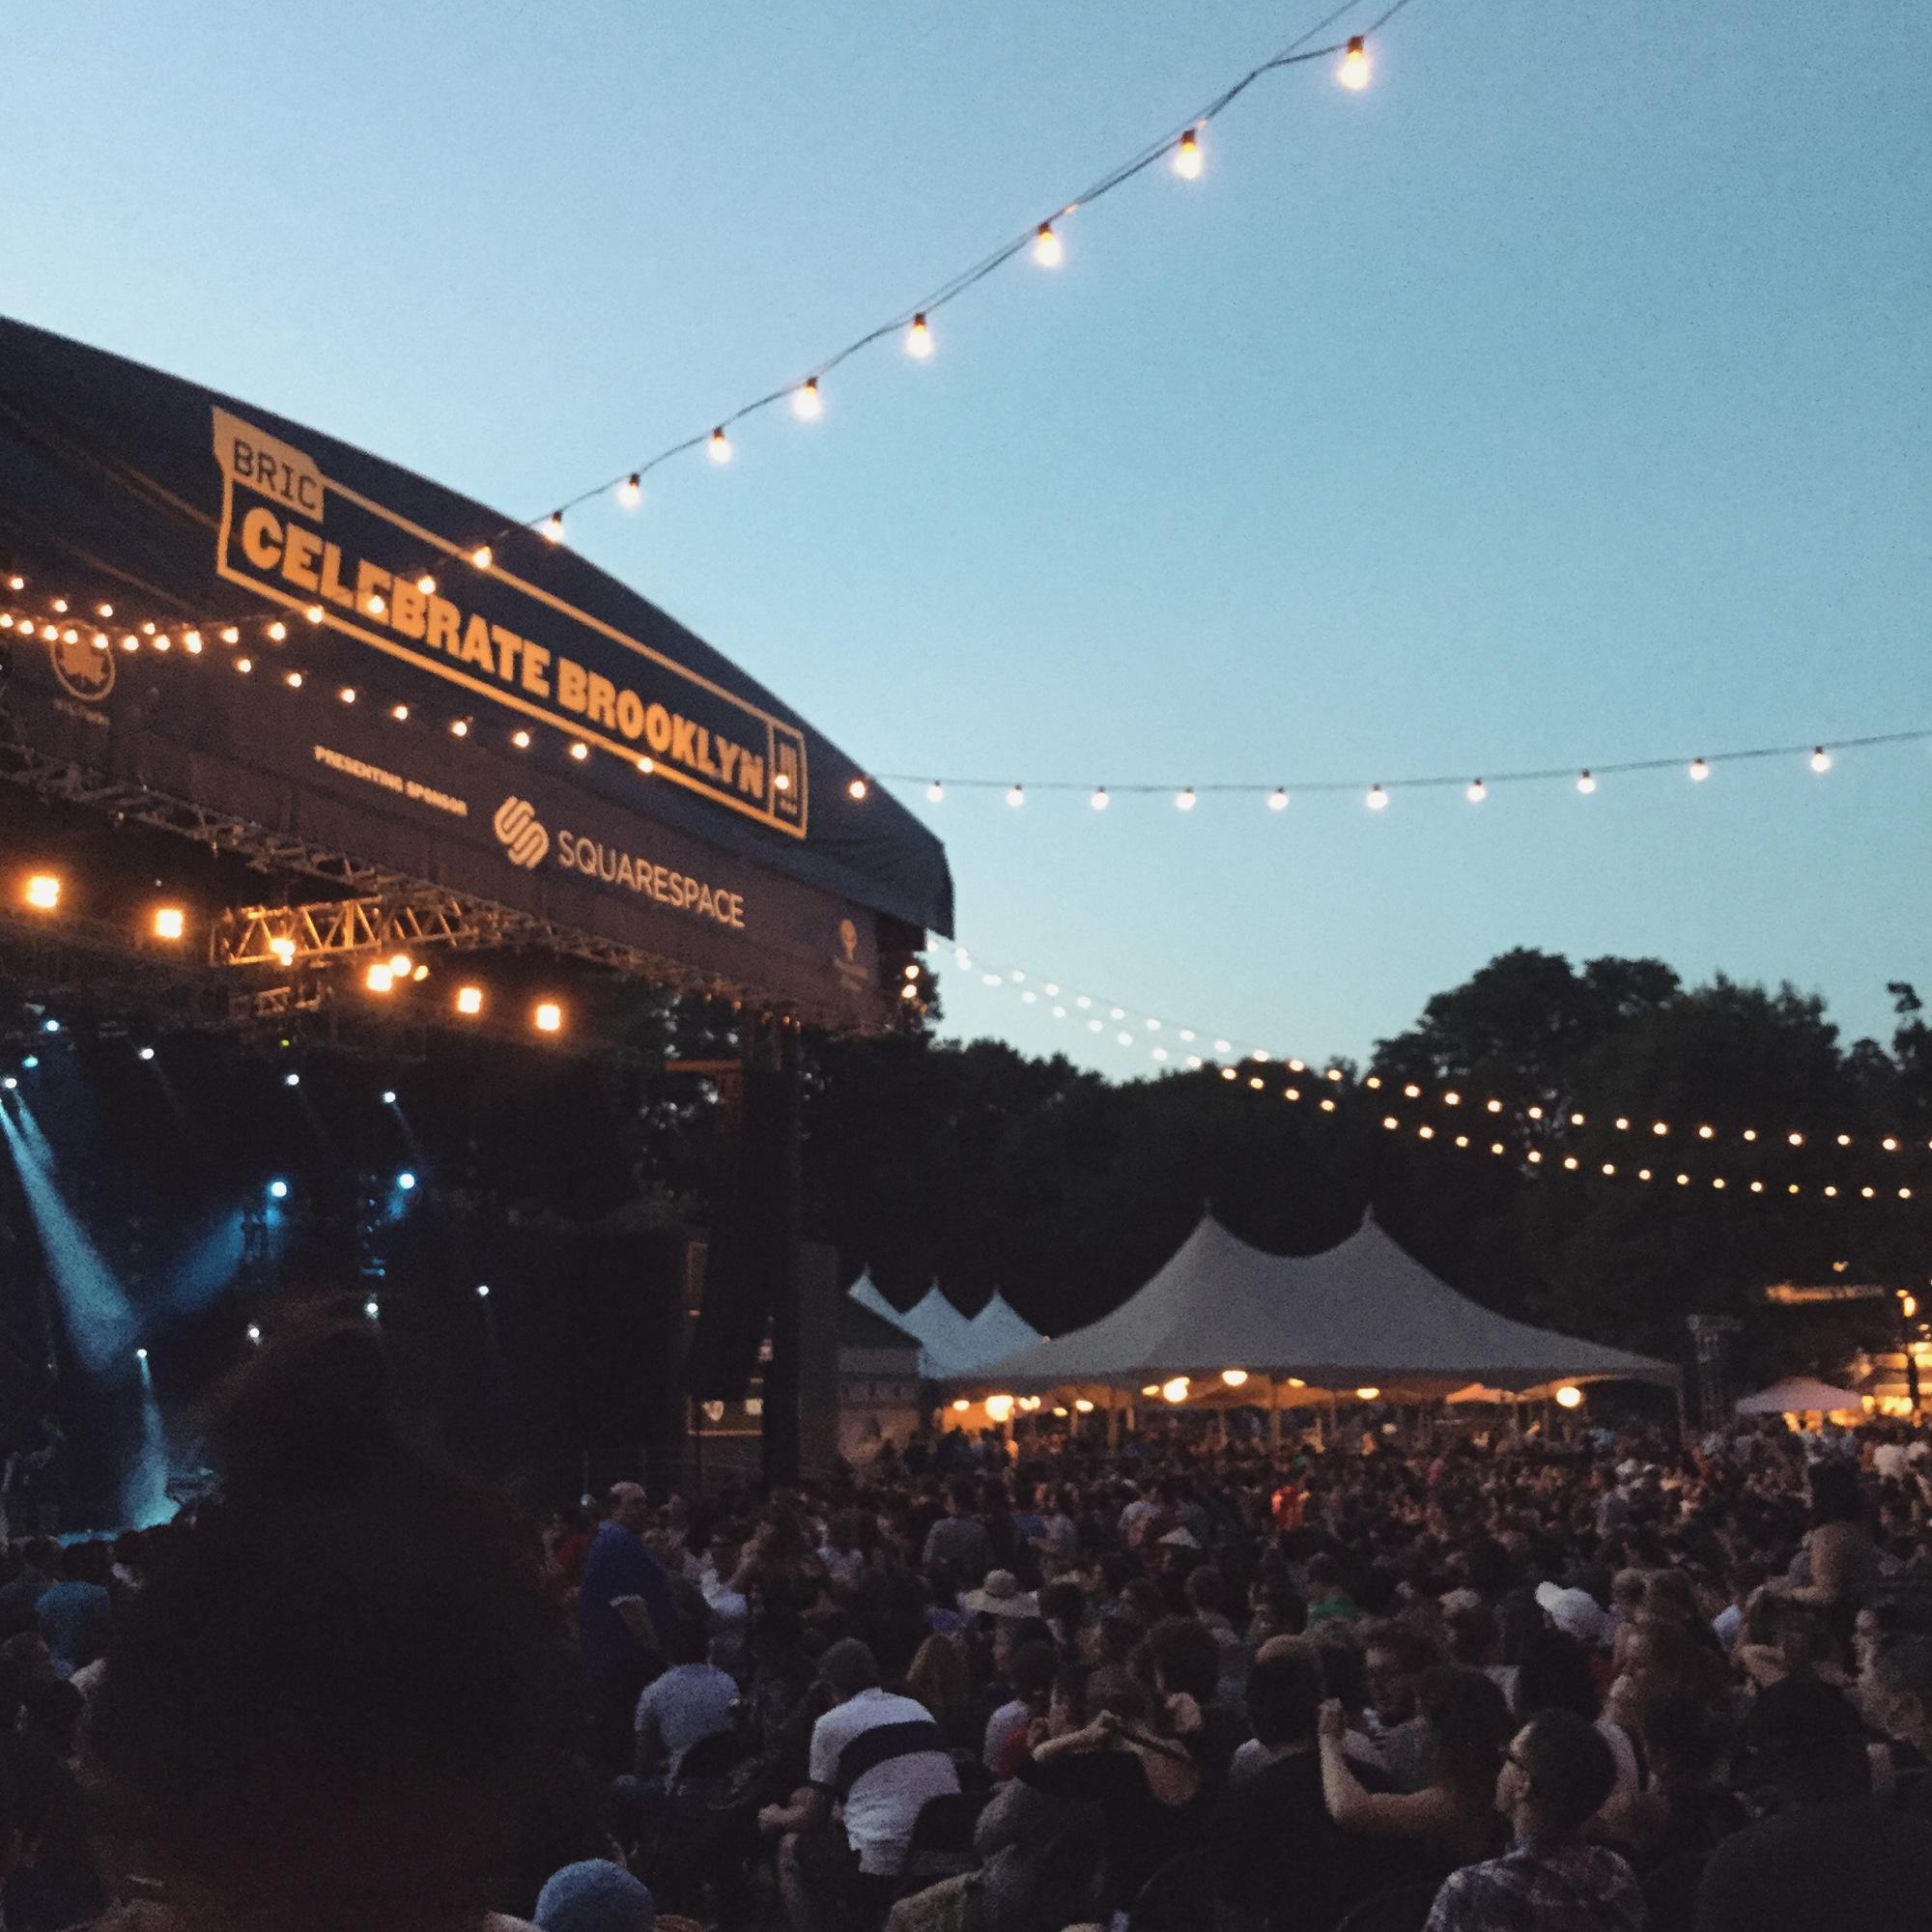 Celebrate Brooklyn stage